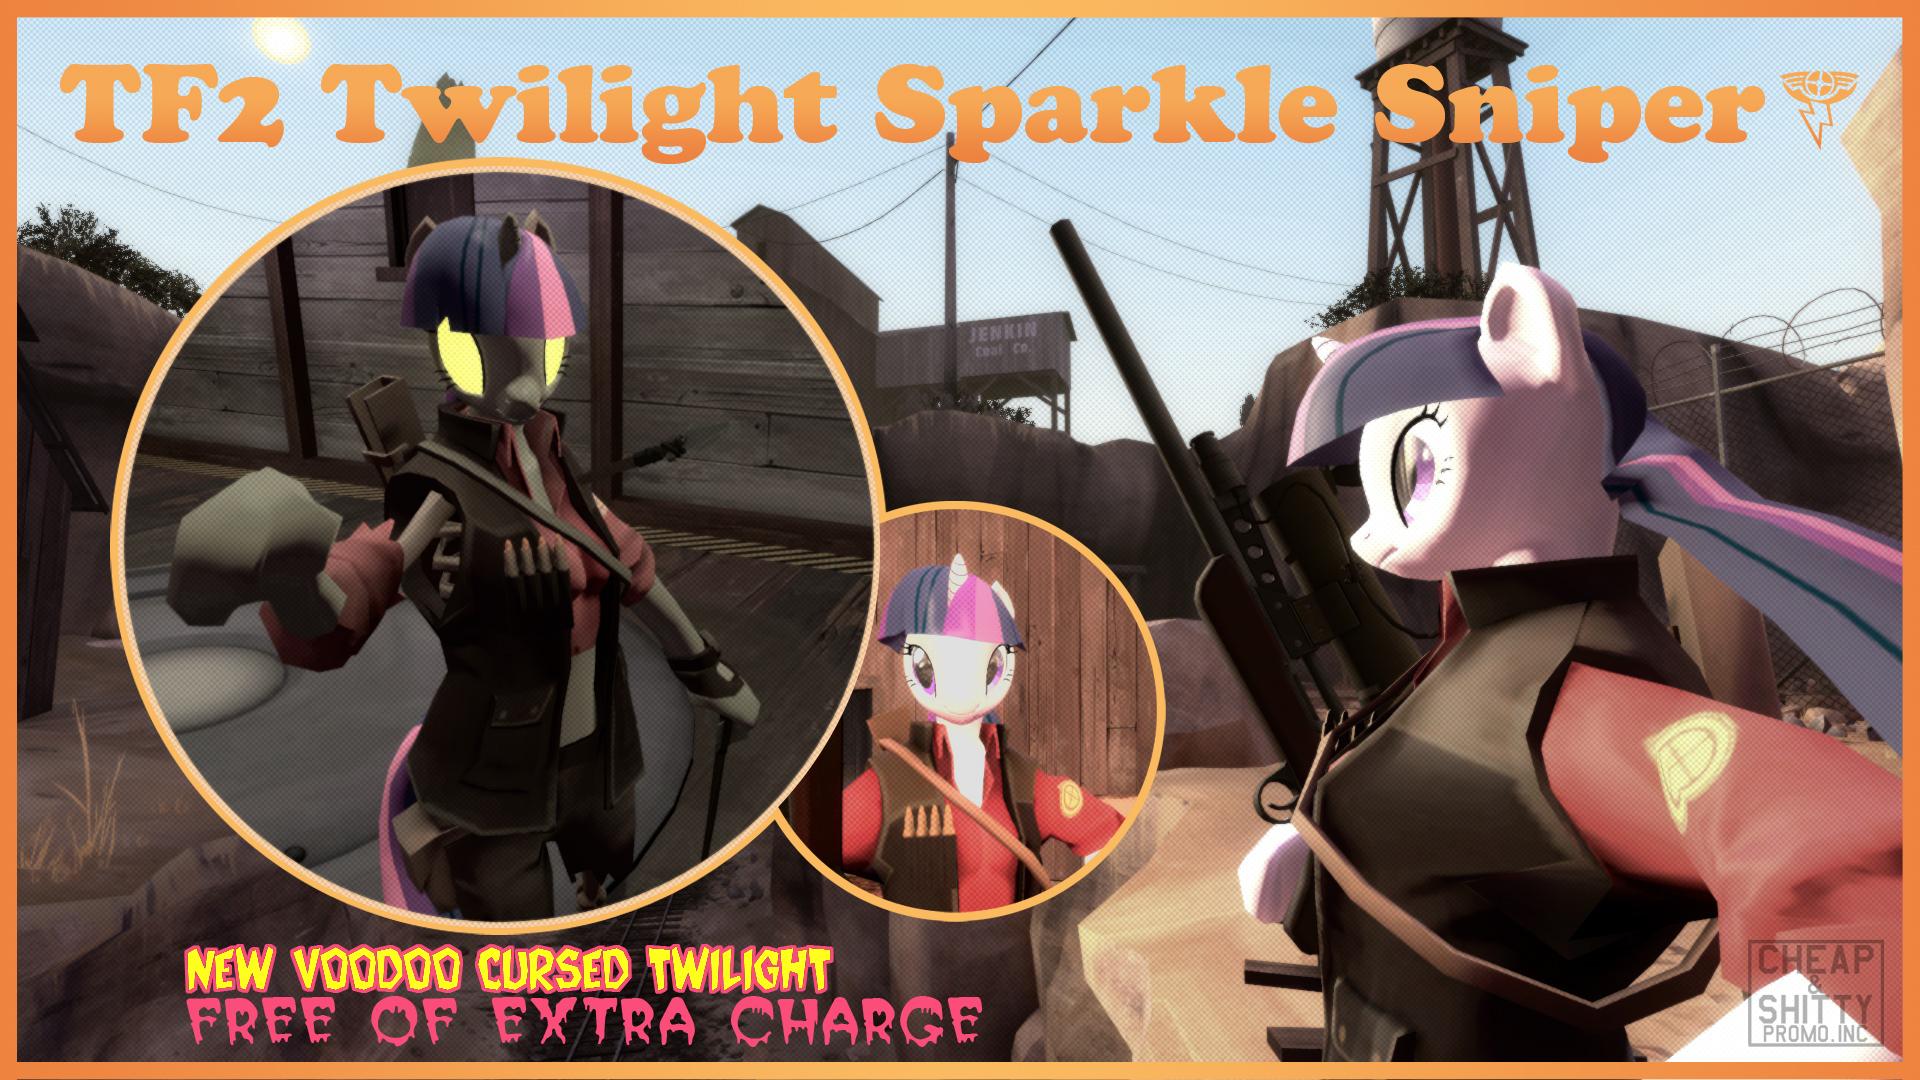 TF2 Twilight Sparkle Sniper by LightningDart on DeviantArt